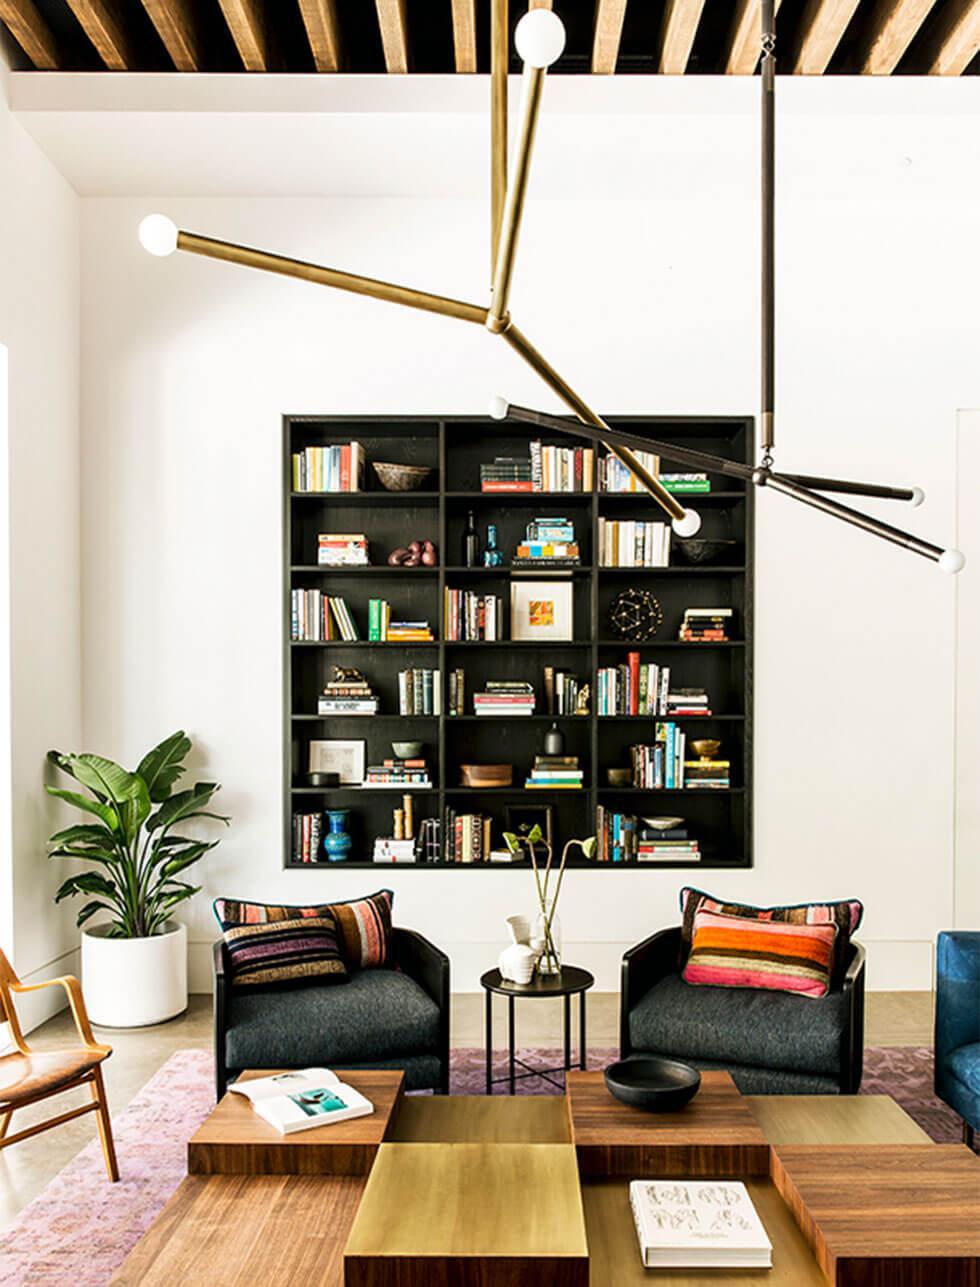 Living room with built bookshelf wall